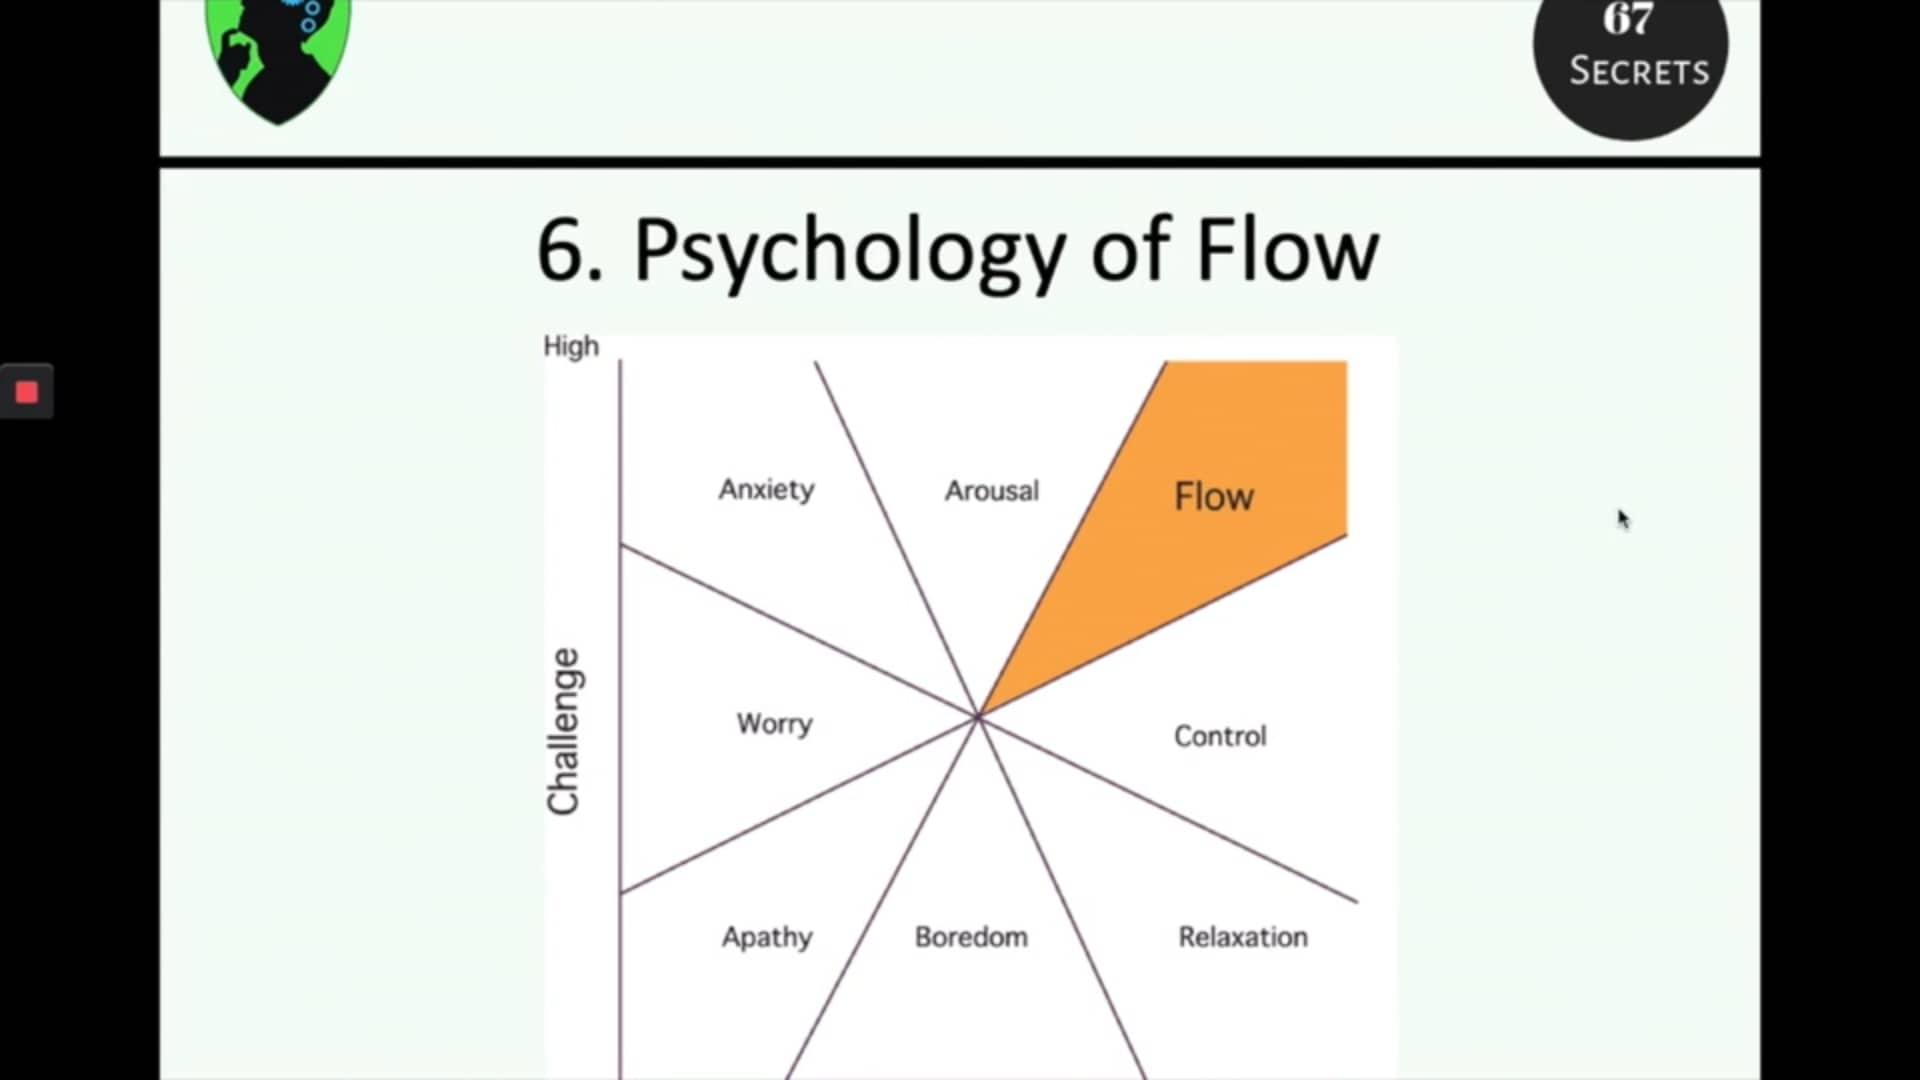 6. psychology of flow (67 Secrets)